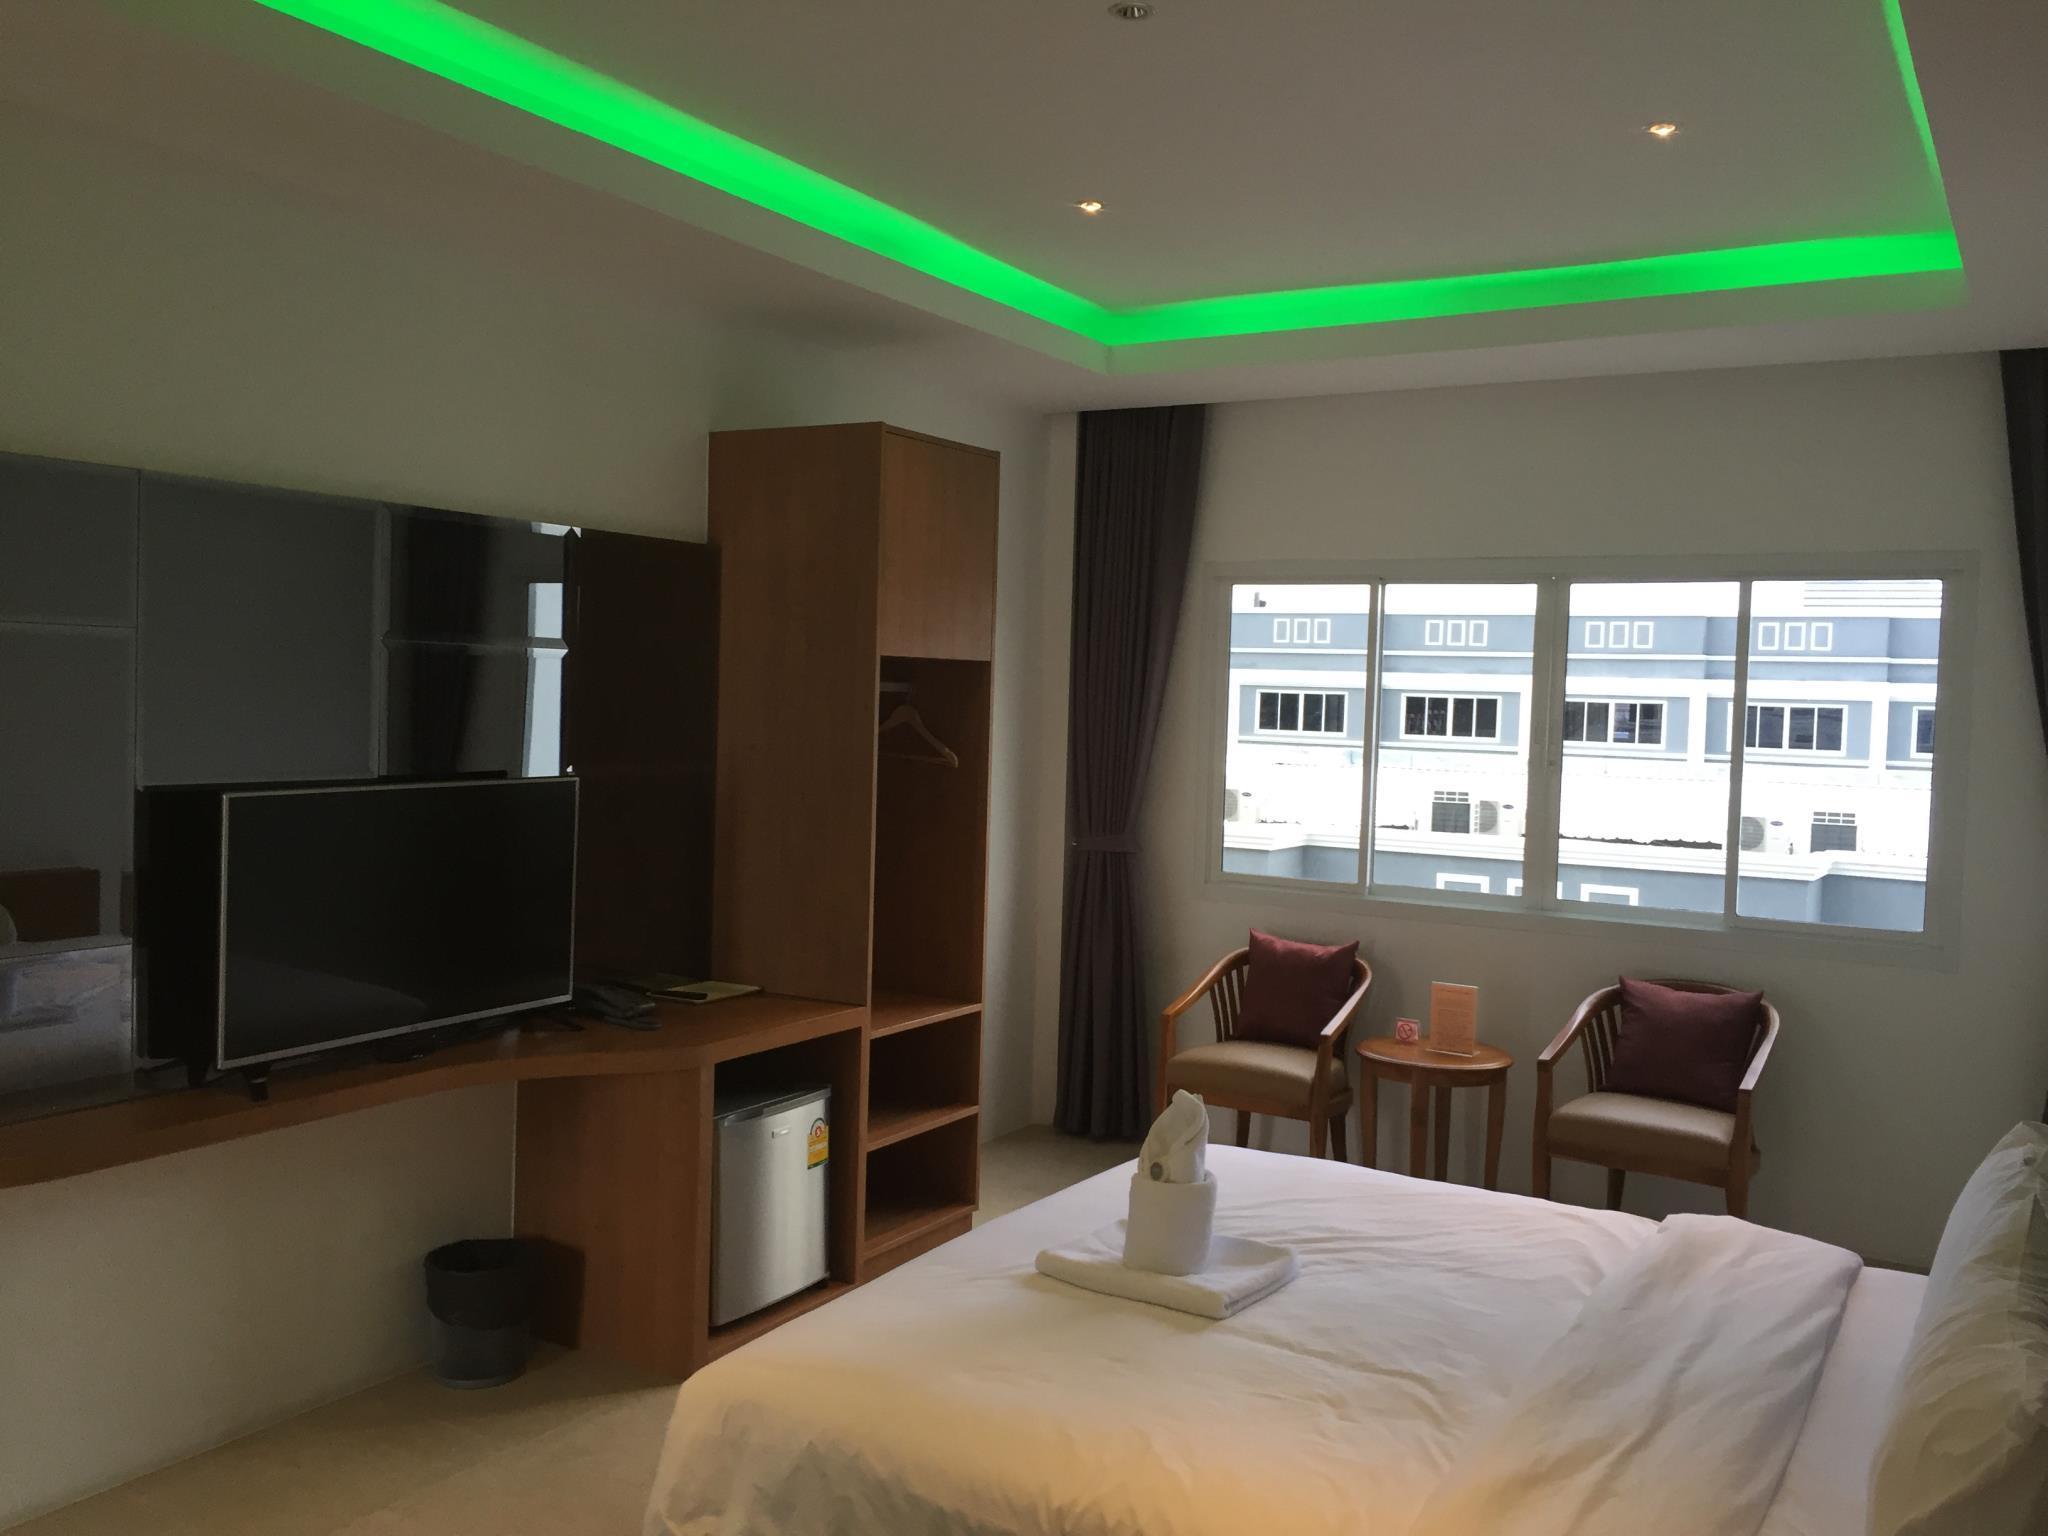 Picasso Hotel 24inn In Central Pattaya